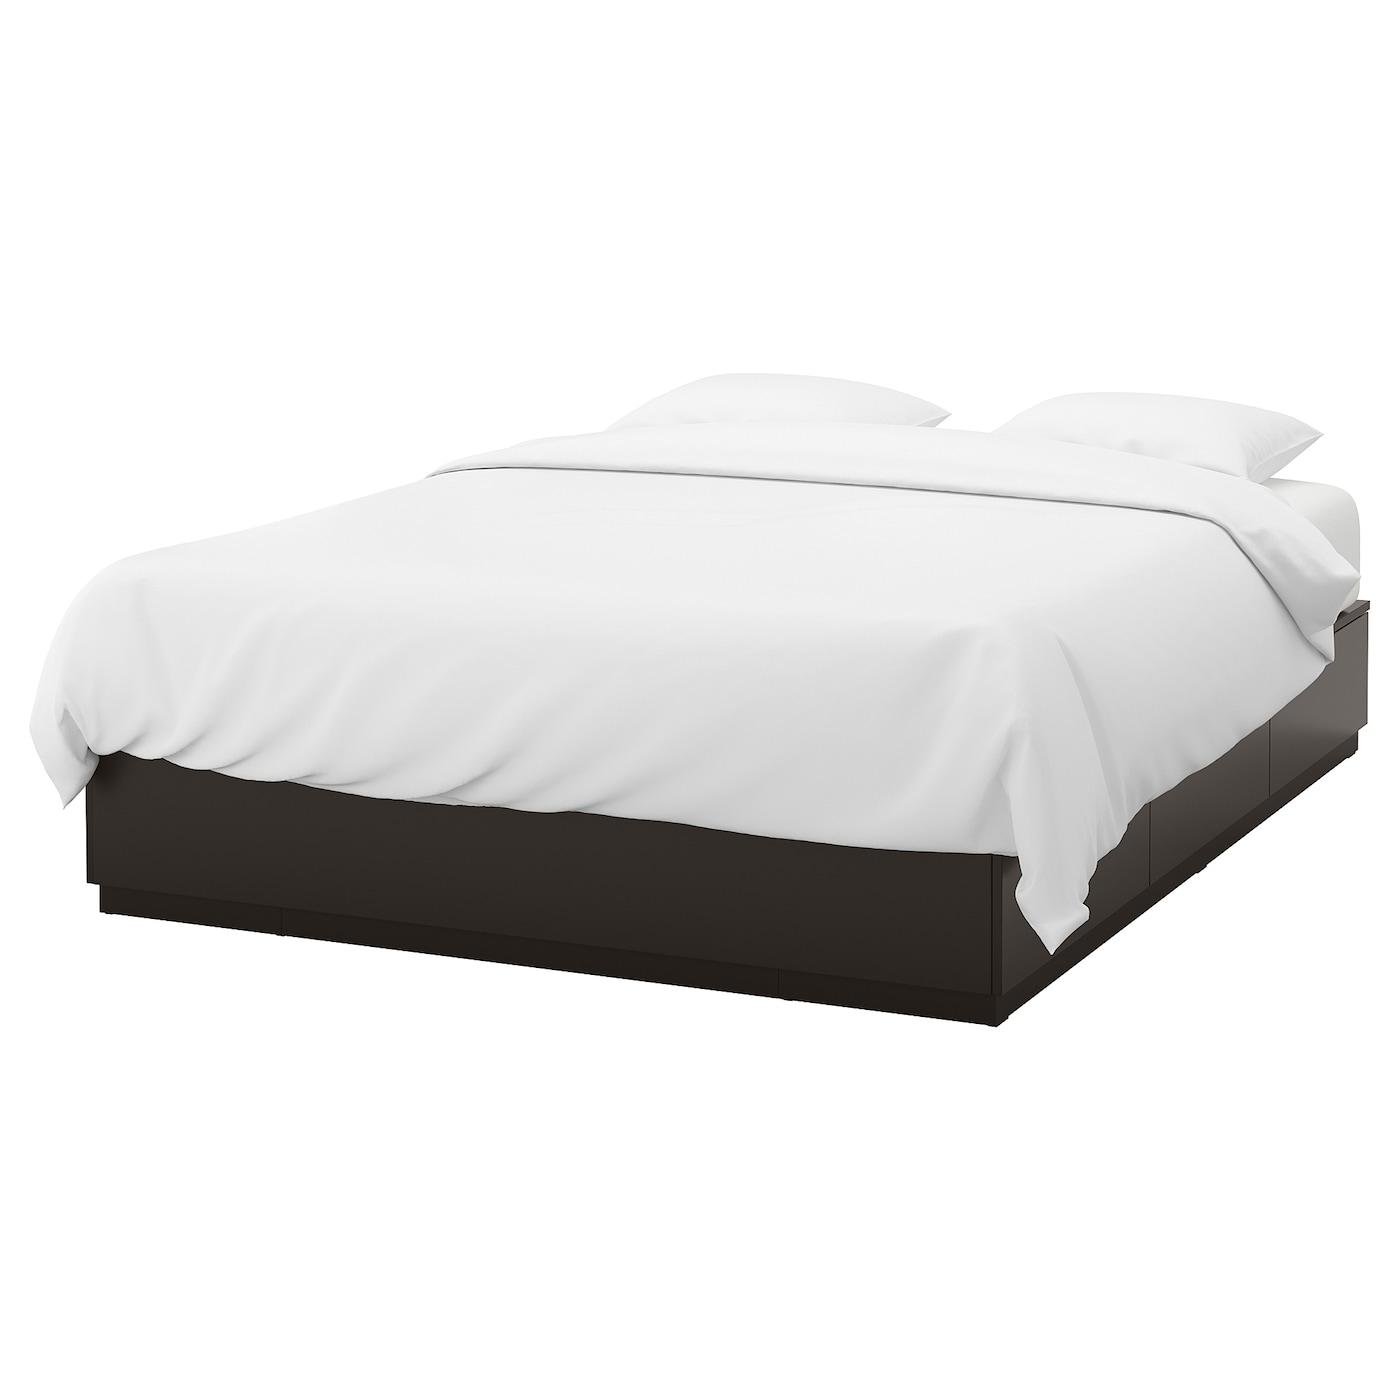 double beds king super king beds ikea ireland dublin. Black Bedroom Furniture Sets. Home Design Ideas